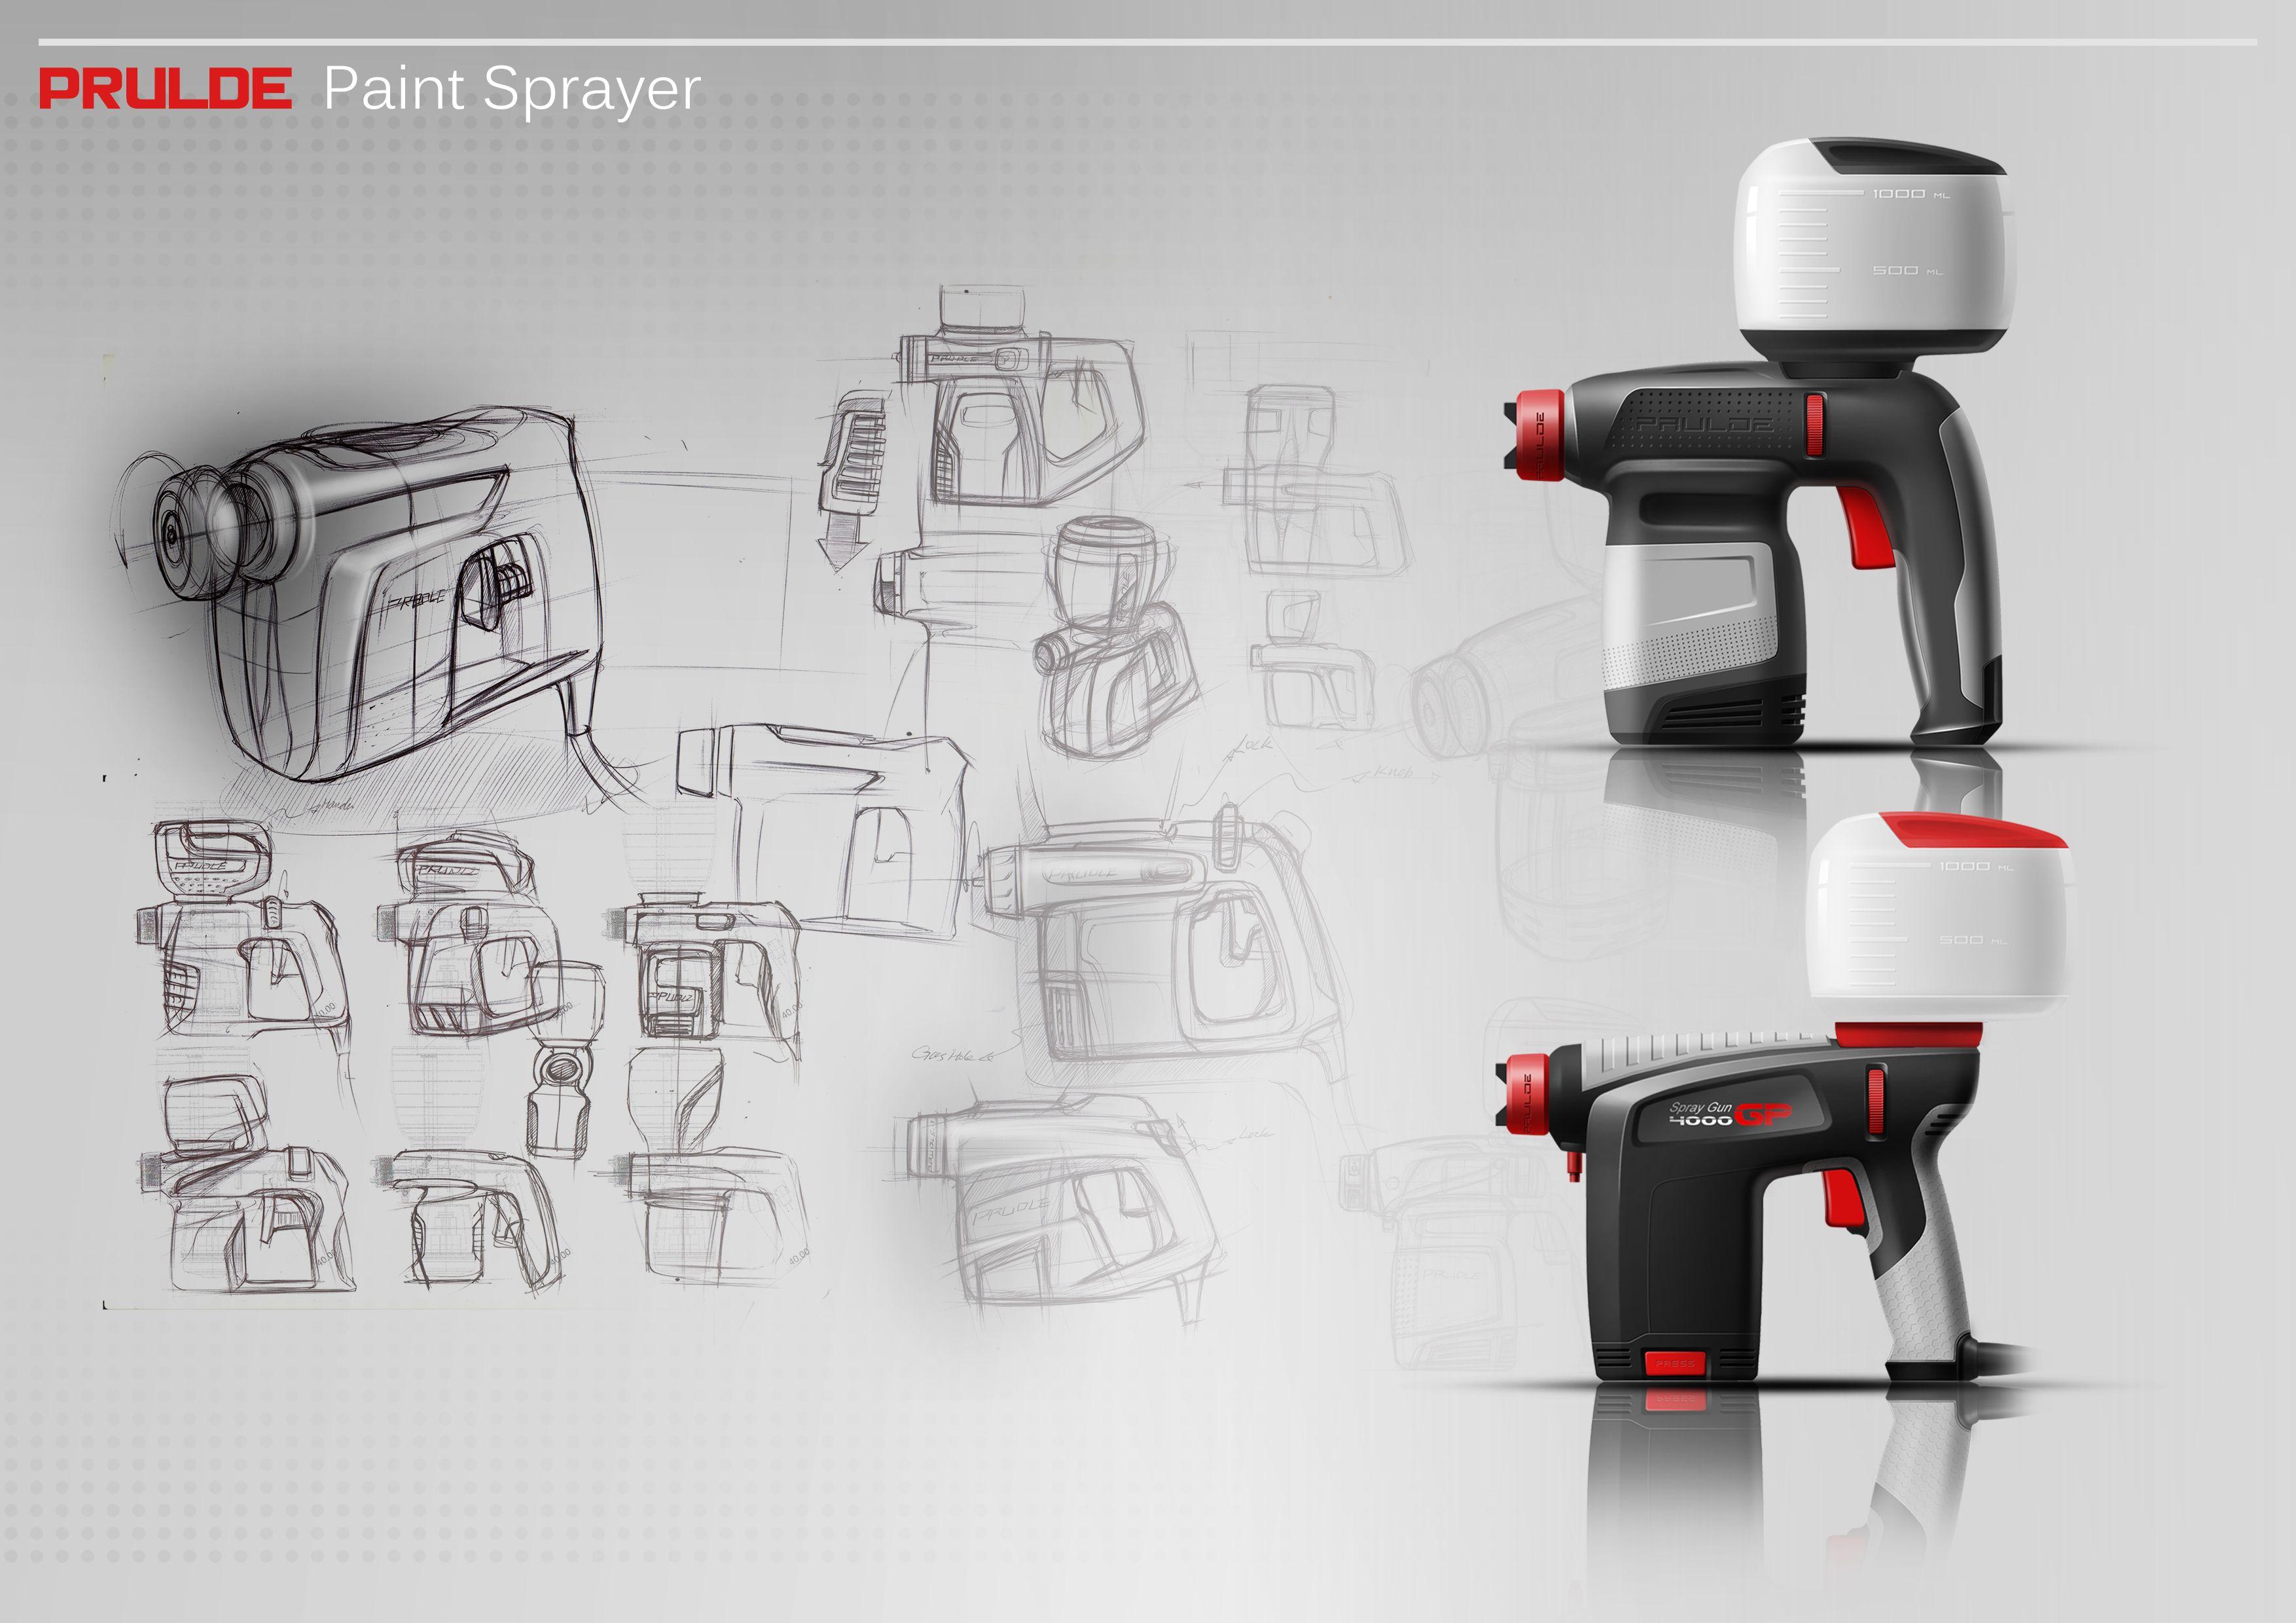 Power Tool Design by Dastan Tung at Coroflot.com